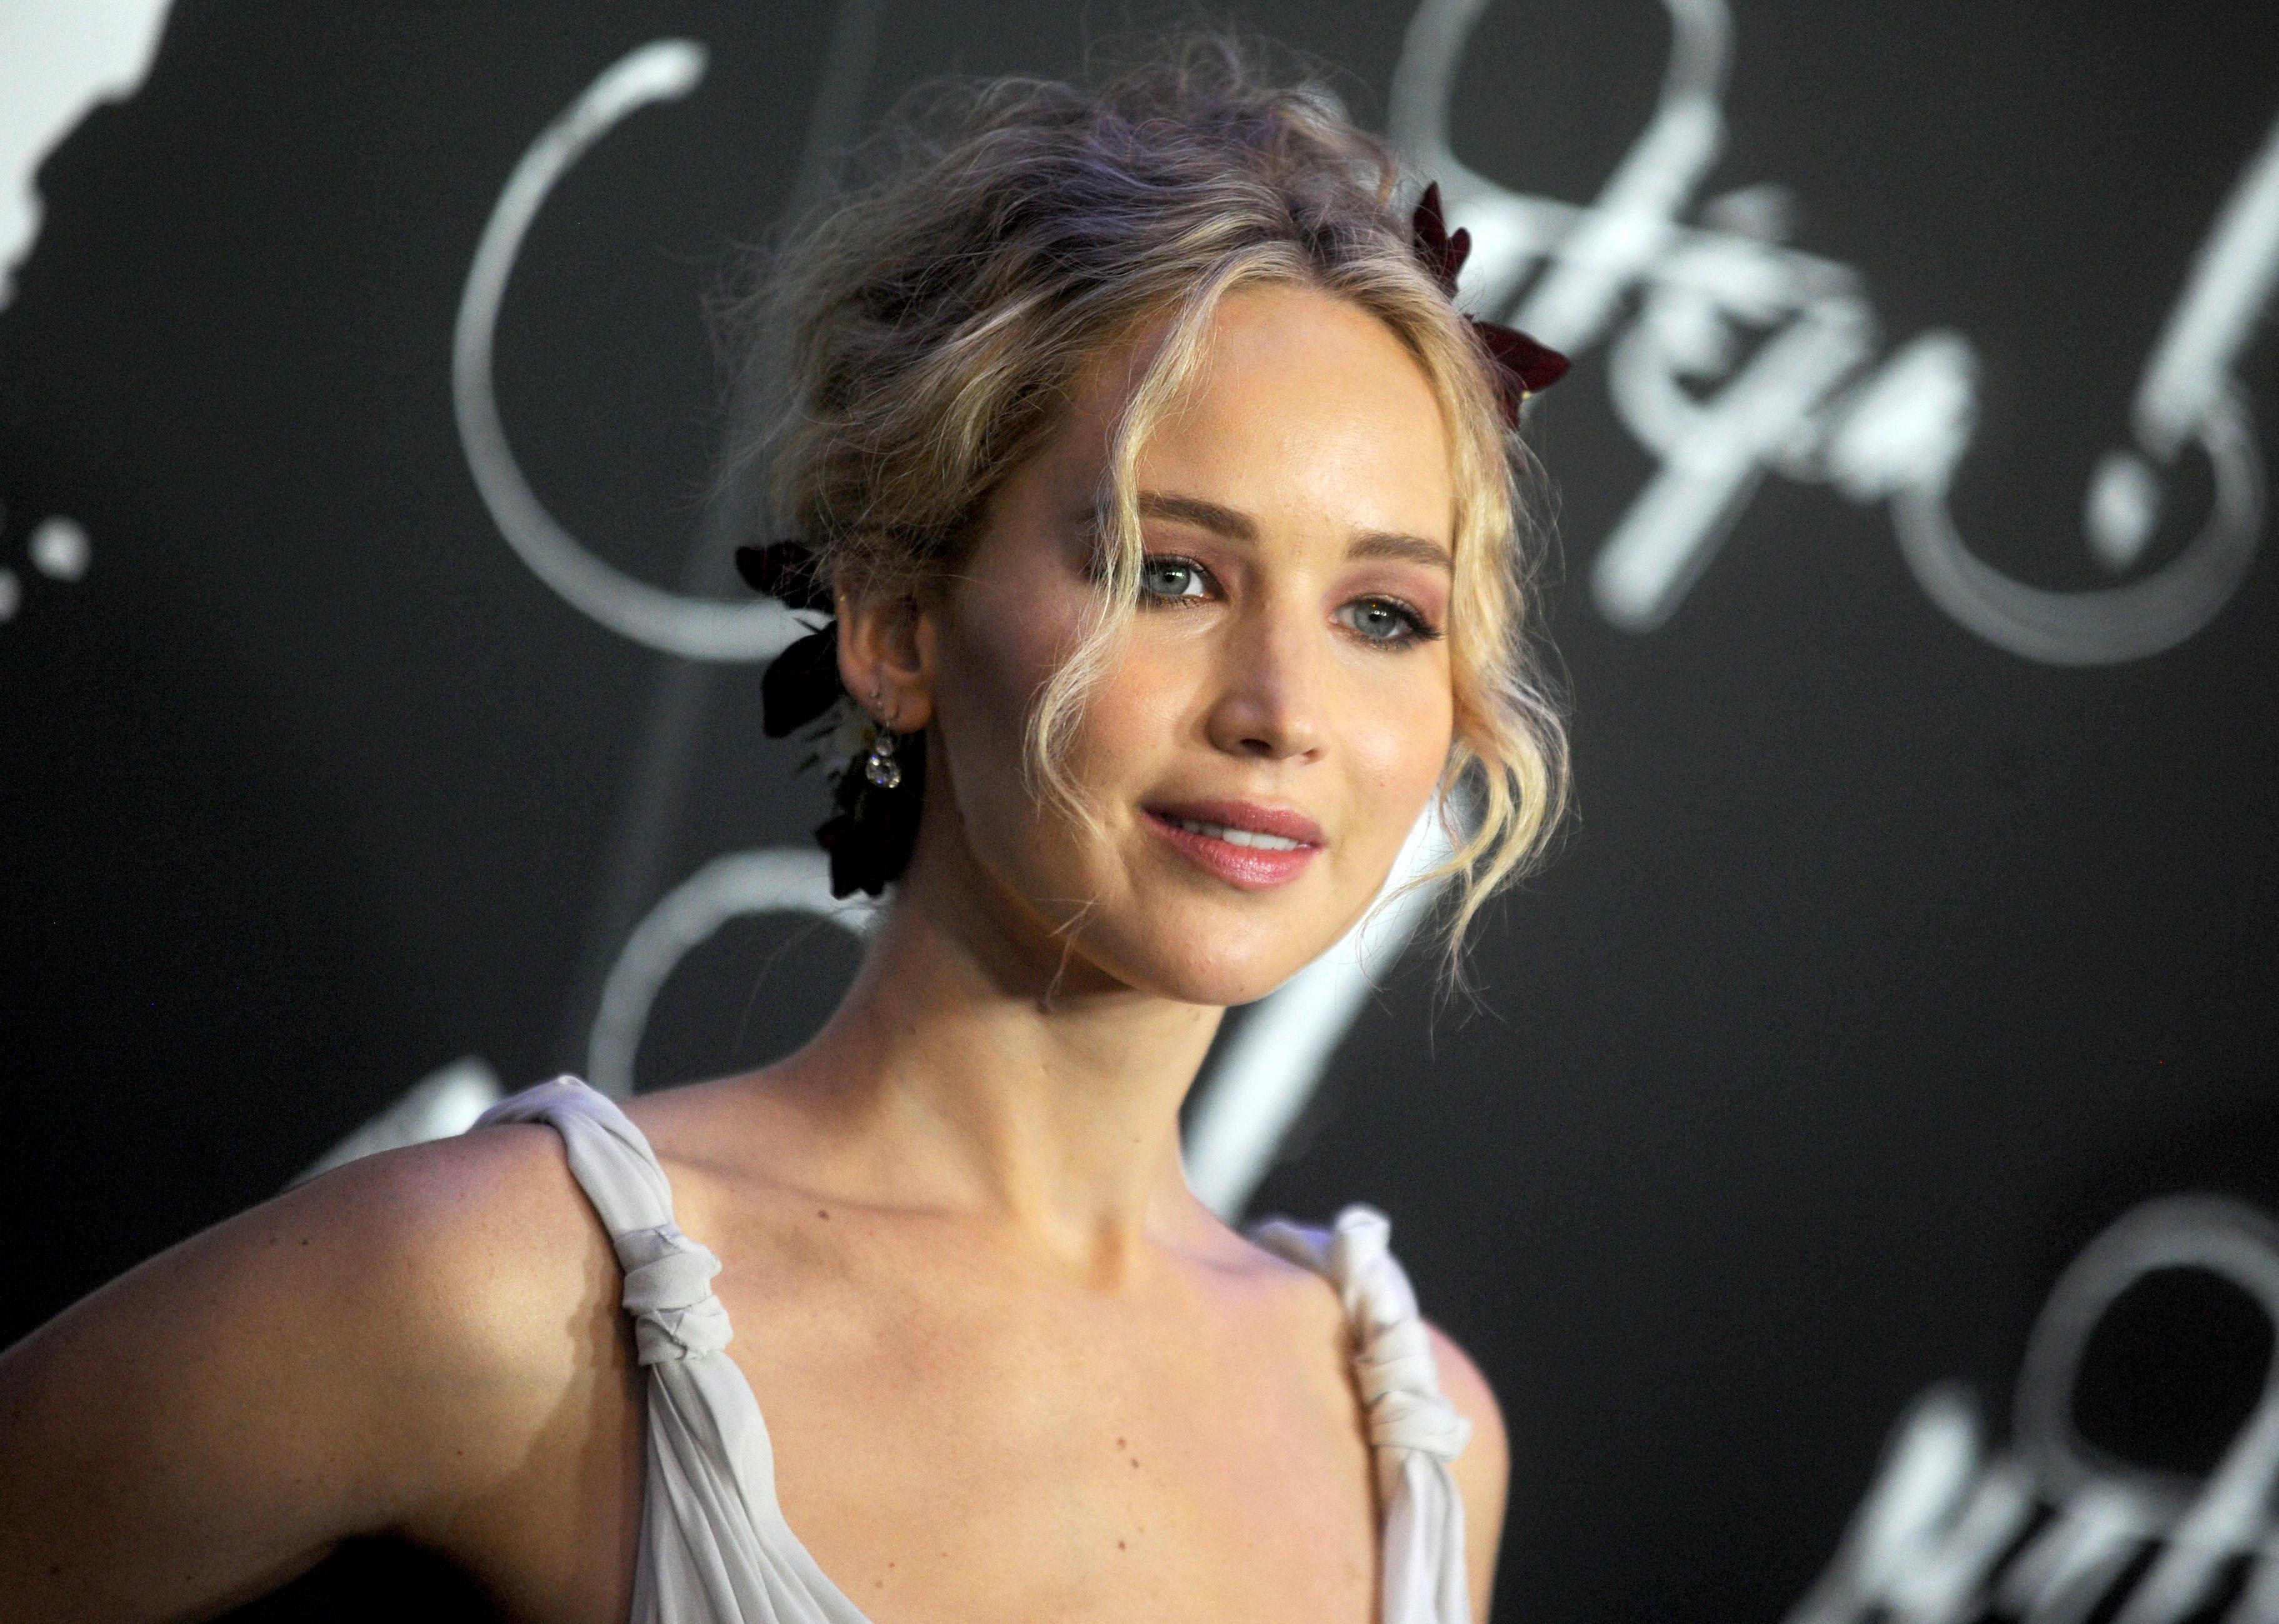 Jennifer Lawrence protagonizará proyecto secreto de A24 y IAC Films